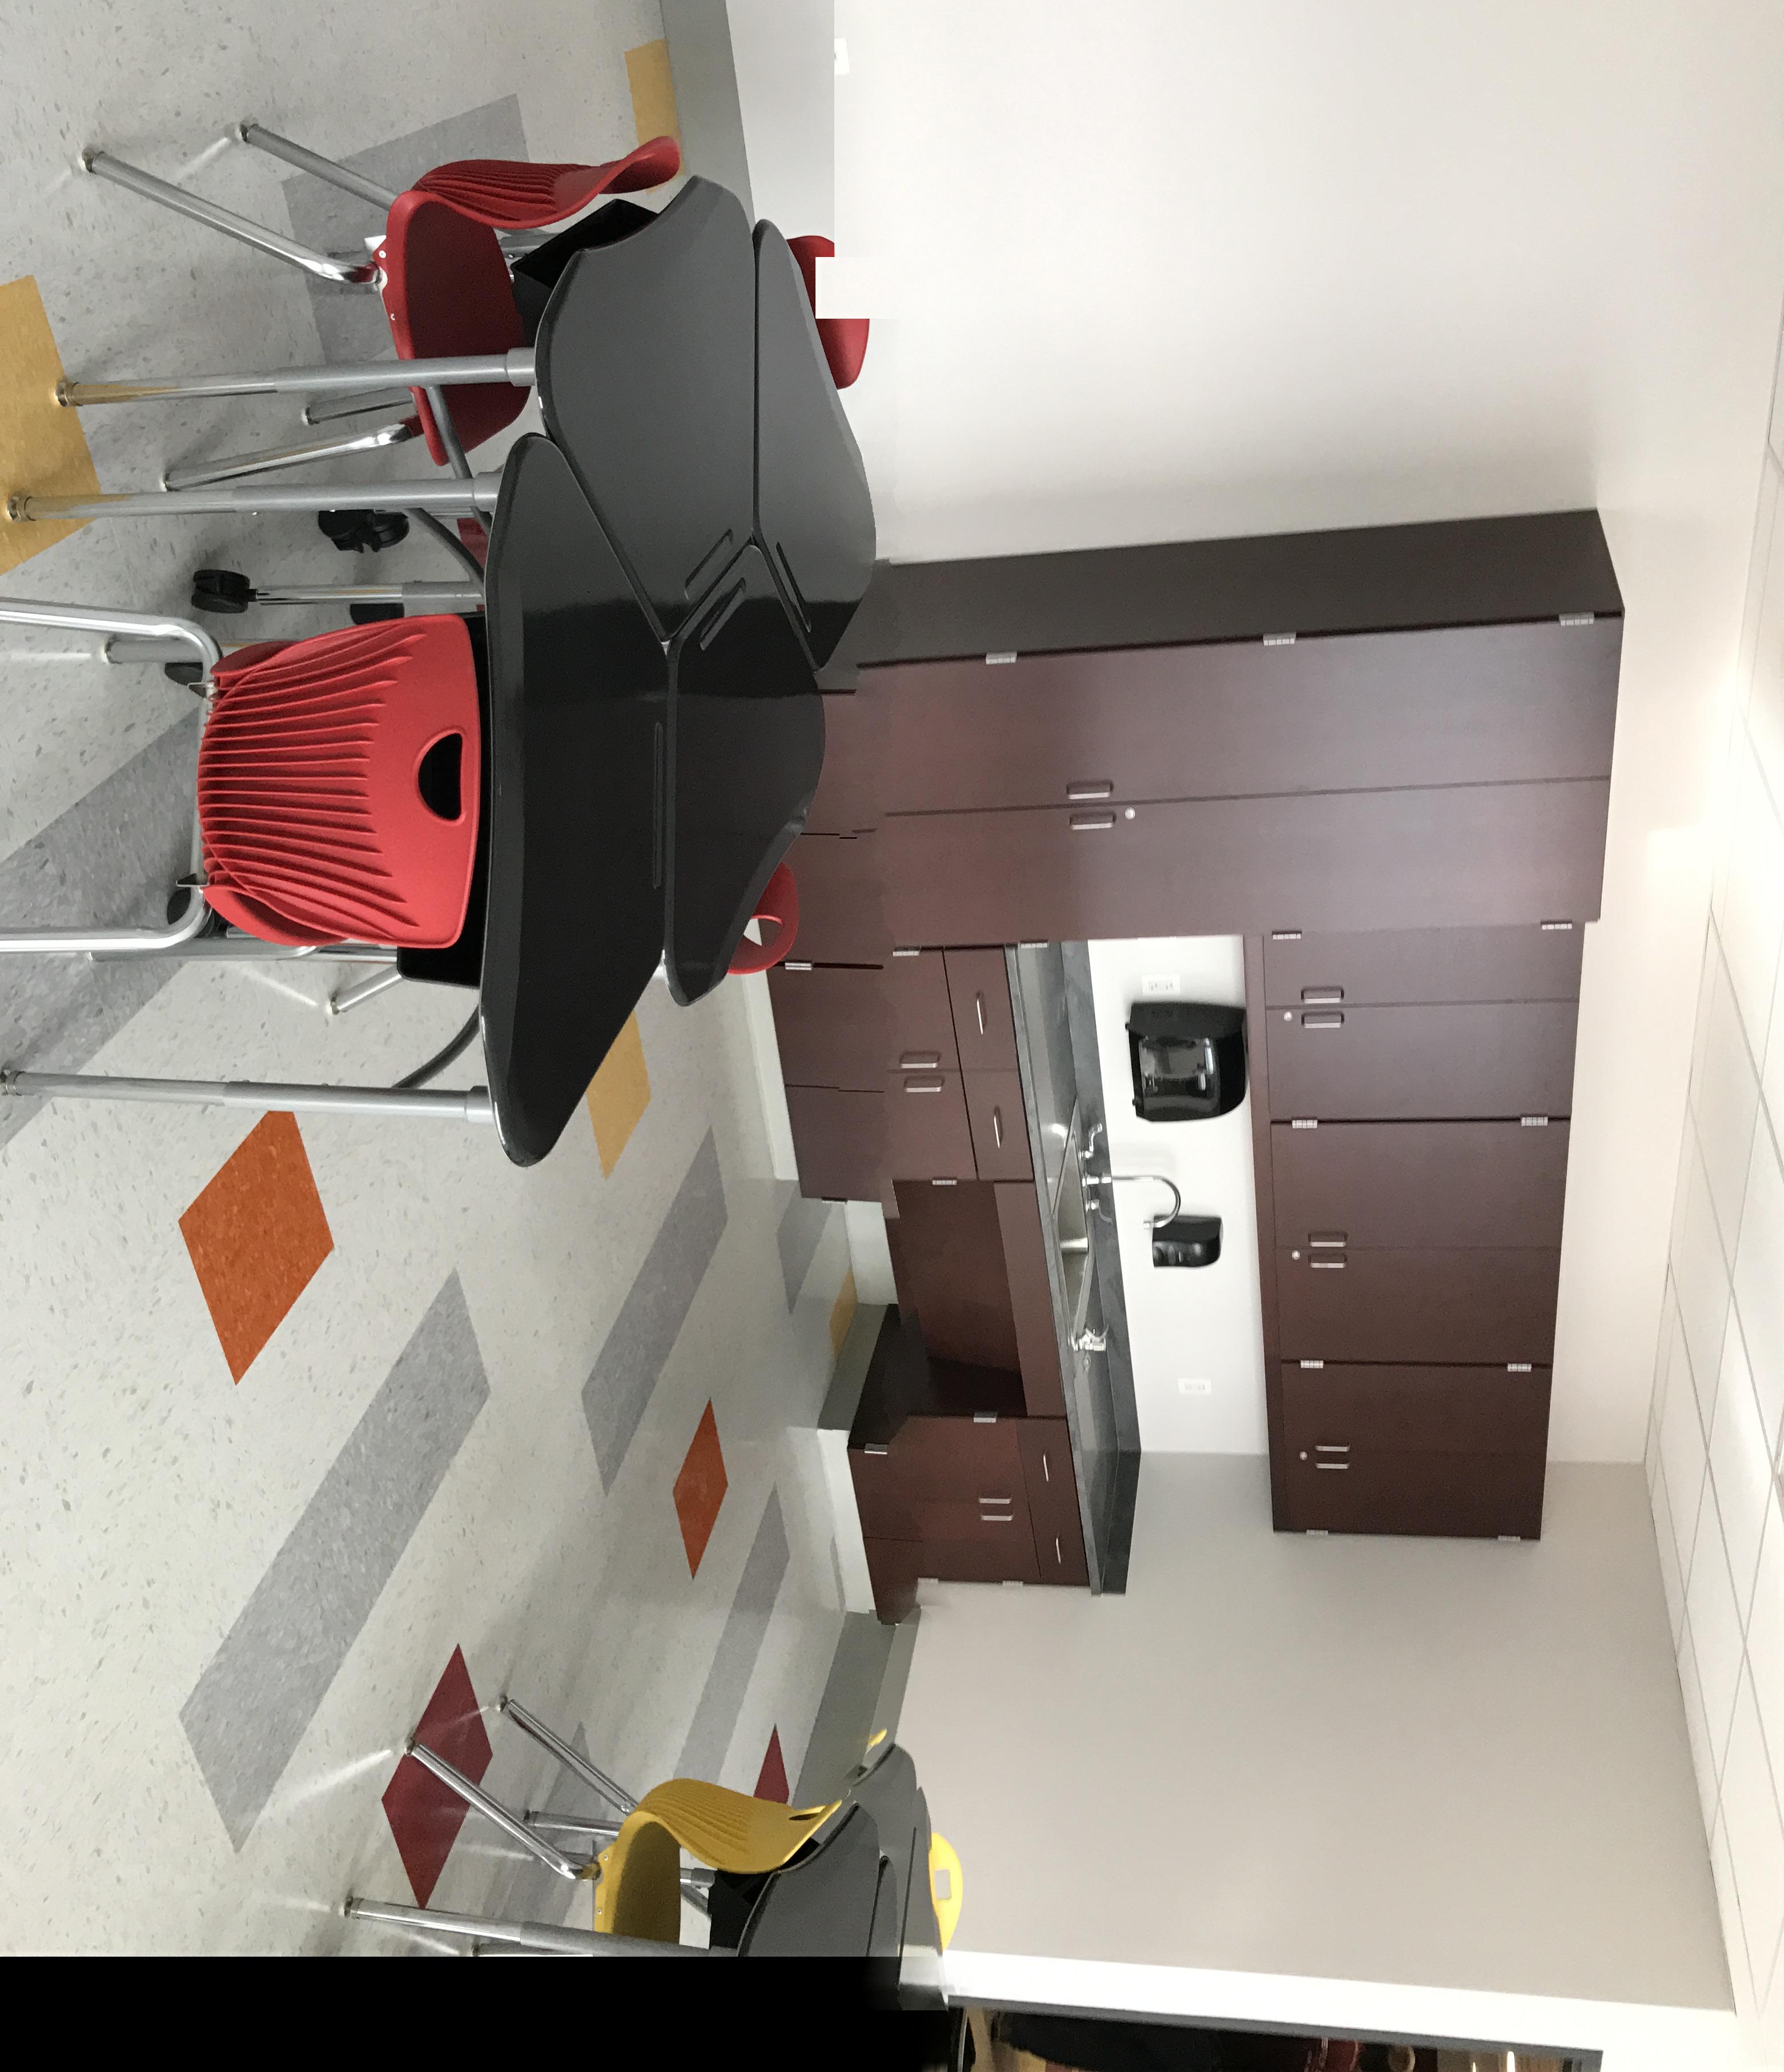 2017 03 15 09 51 05 134 Pemco Furniture